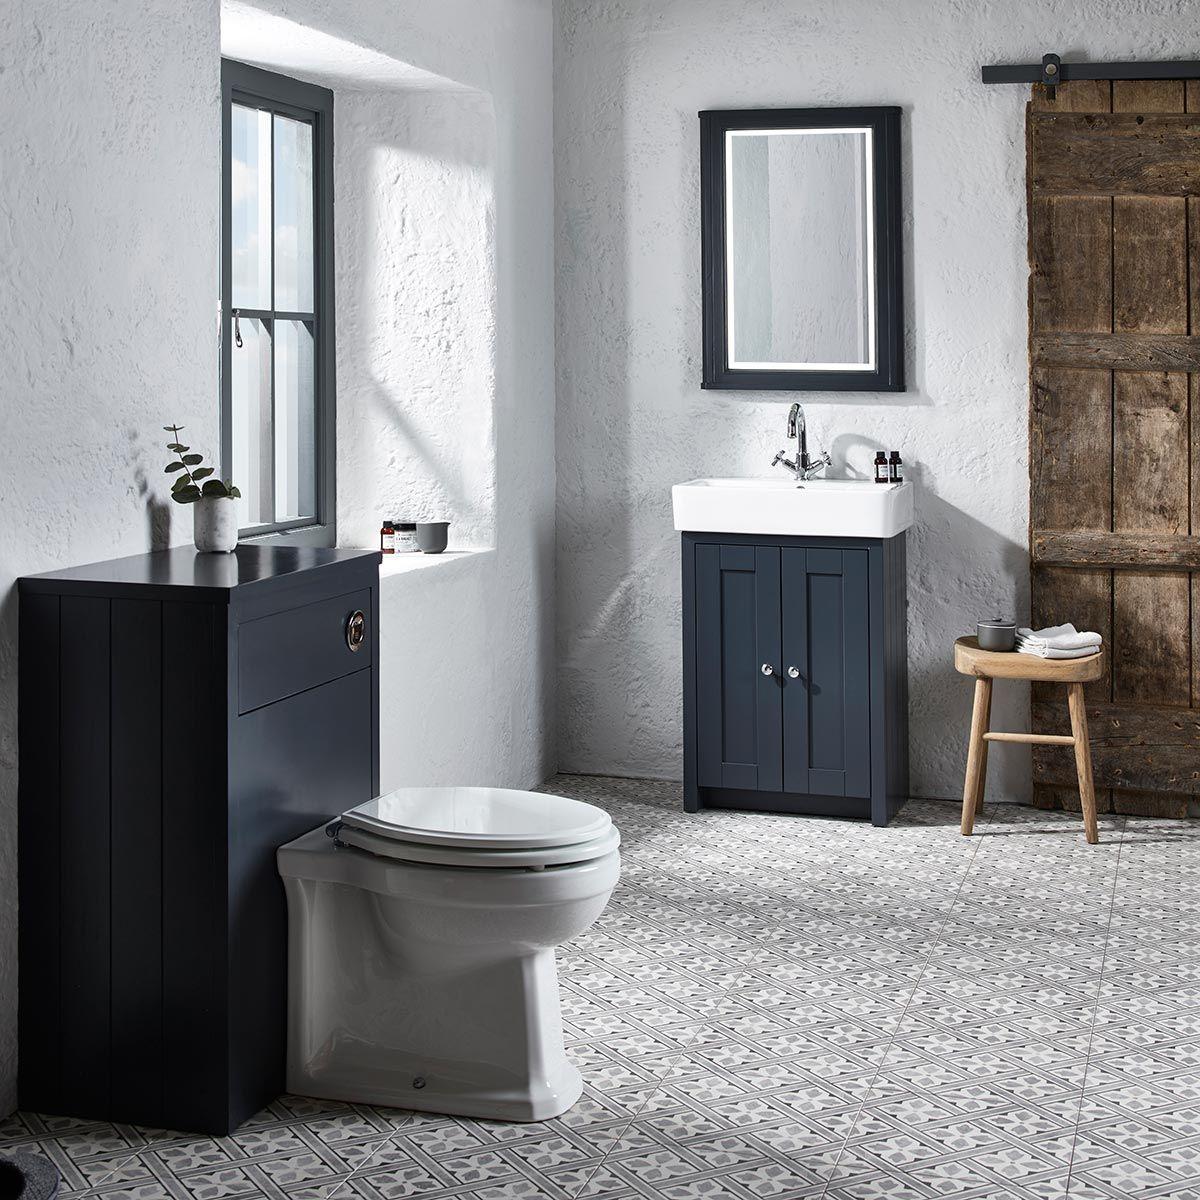 Tavistock Lansdown Vanity Unit Basin, Dark Grey Bathroom Vanity Unit